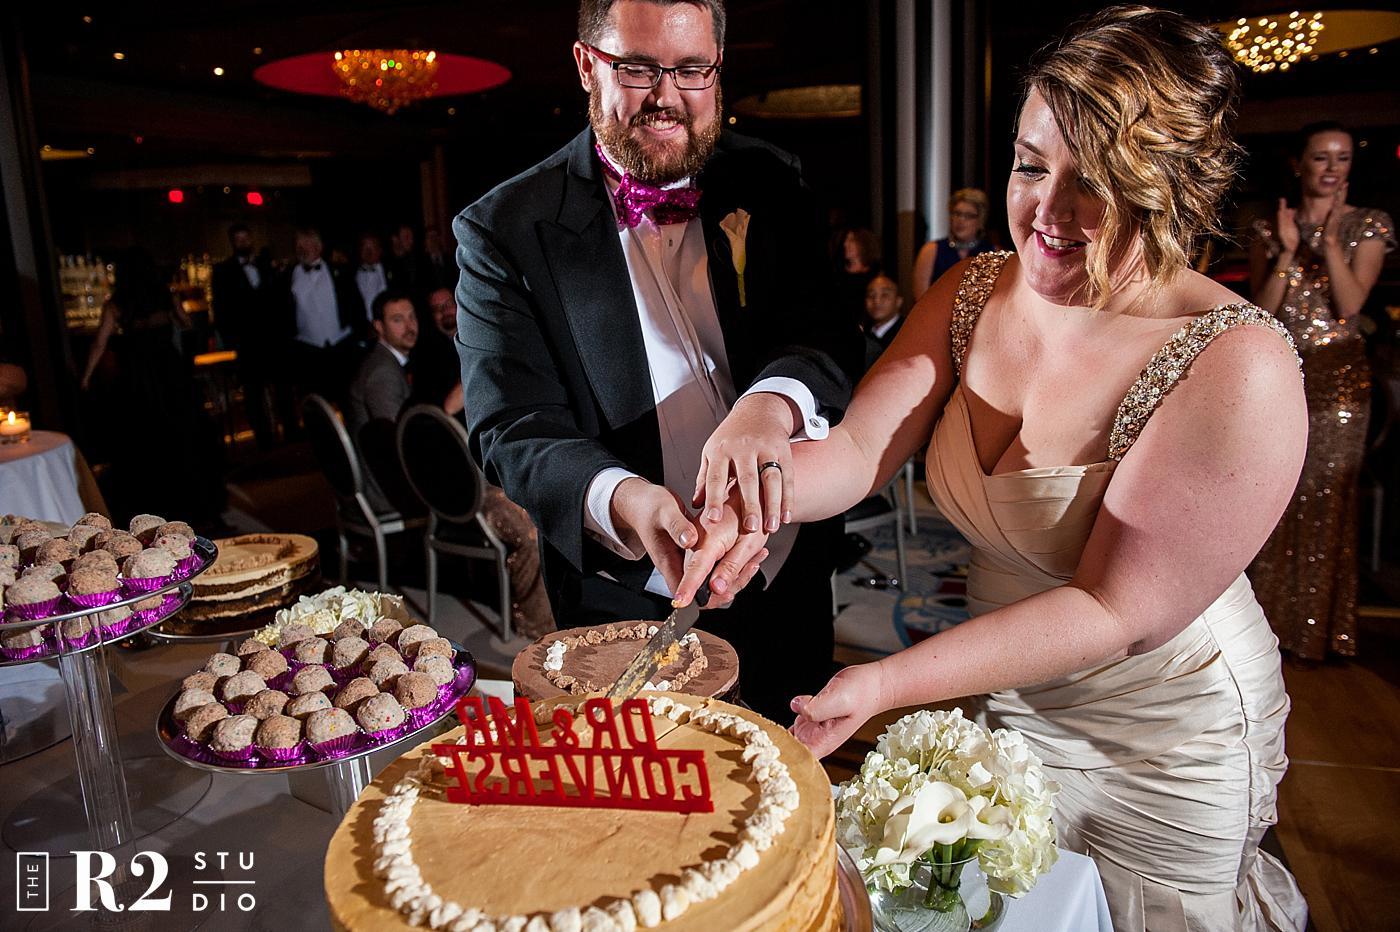 #desirableeventsbydesi, #weddingplannerlasvegas,#lasvegasweddingcoordinators,#weddingcoordinatorslasvegas,#weddingcoordinatorlasvegas,#lasvegasweddingplanner #desirableeventsbydesi #Tropicanawedding #wedding, #love, #lovewins, #samesexwedding, #gaywedding, #tropicana, #lasvegaswedding, #weddinglasvegas, #weddingplannerslasvegas, #lasvegasweddingplanners, # layersoflovely, #lasvegaswedding, #susieandwill, #rusticwedding, #wedding, #historic5thstreetschool, #downtownlasvegas, #sls, #sayersclub, #bazaarmeats, #slslv, #slslasvegas #slsweddings, #lasvegasweddings, #cakecutting, #milkbar